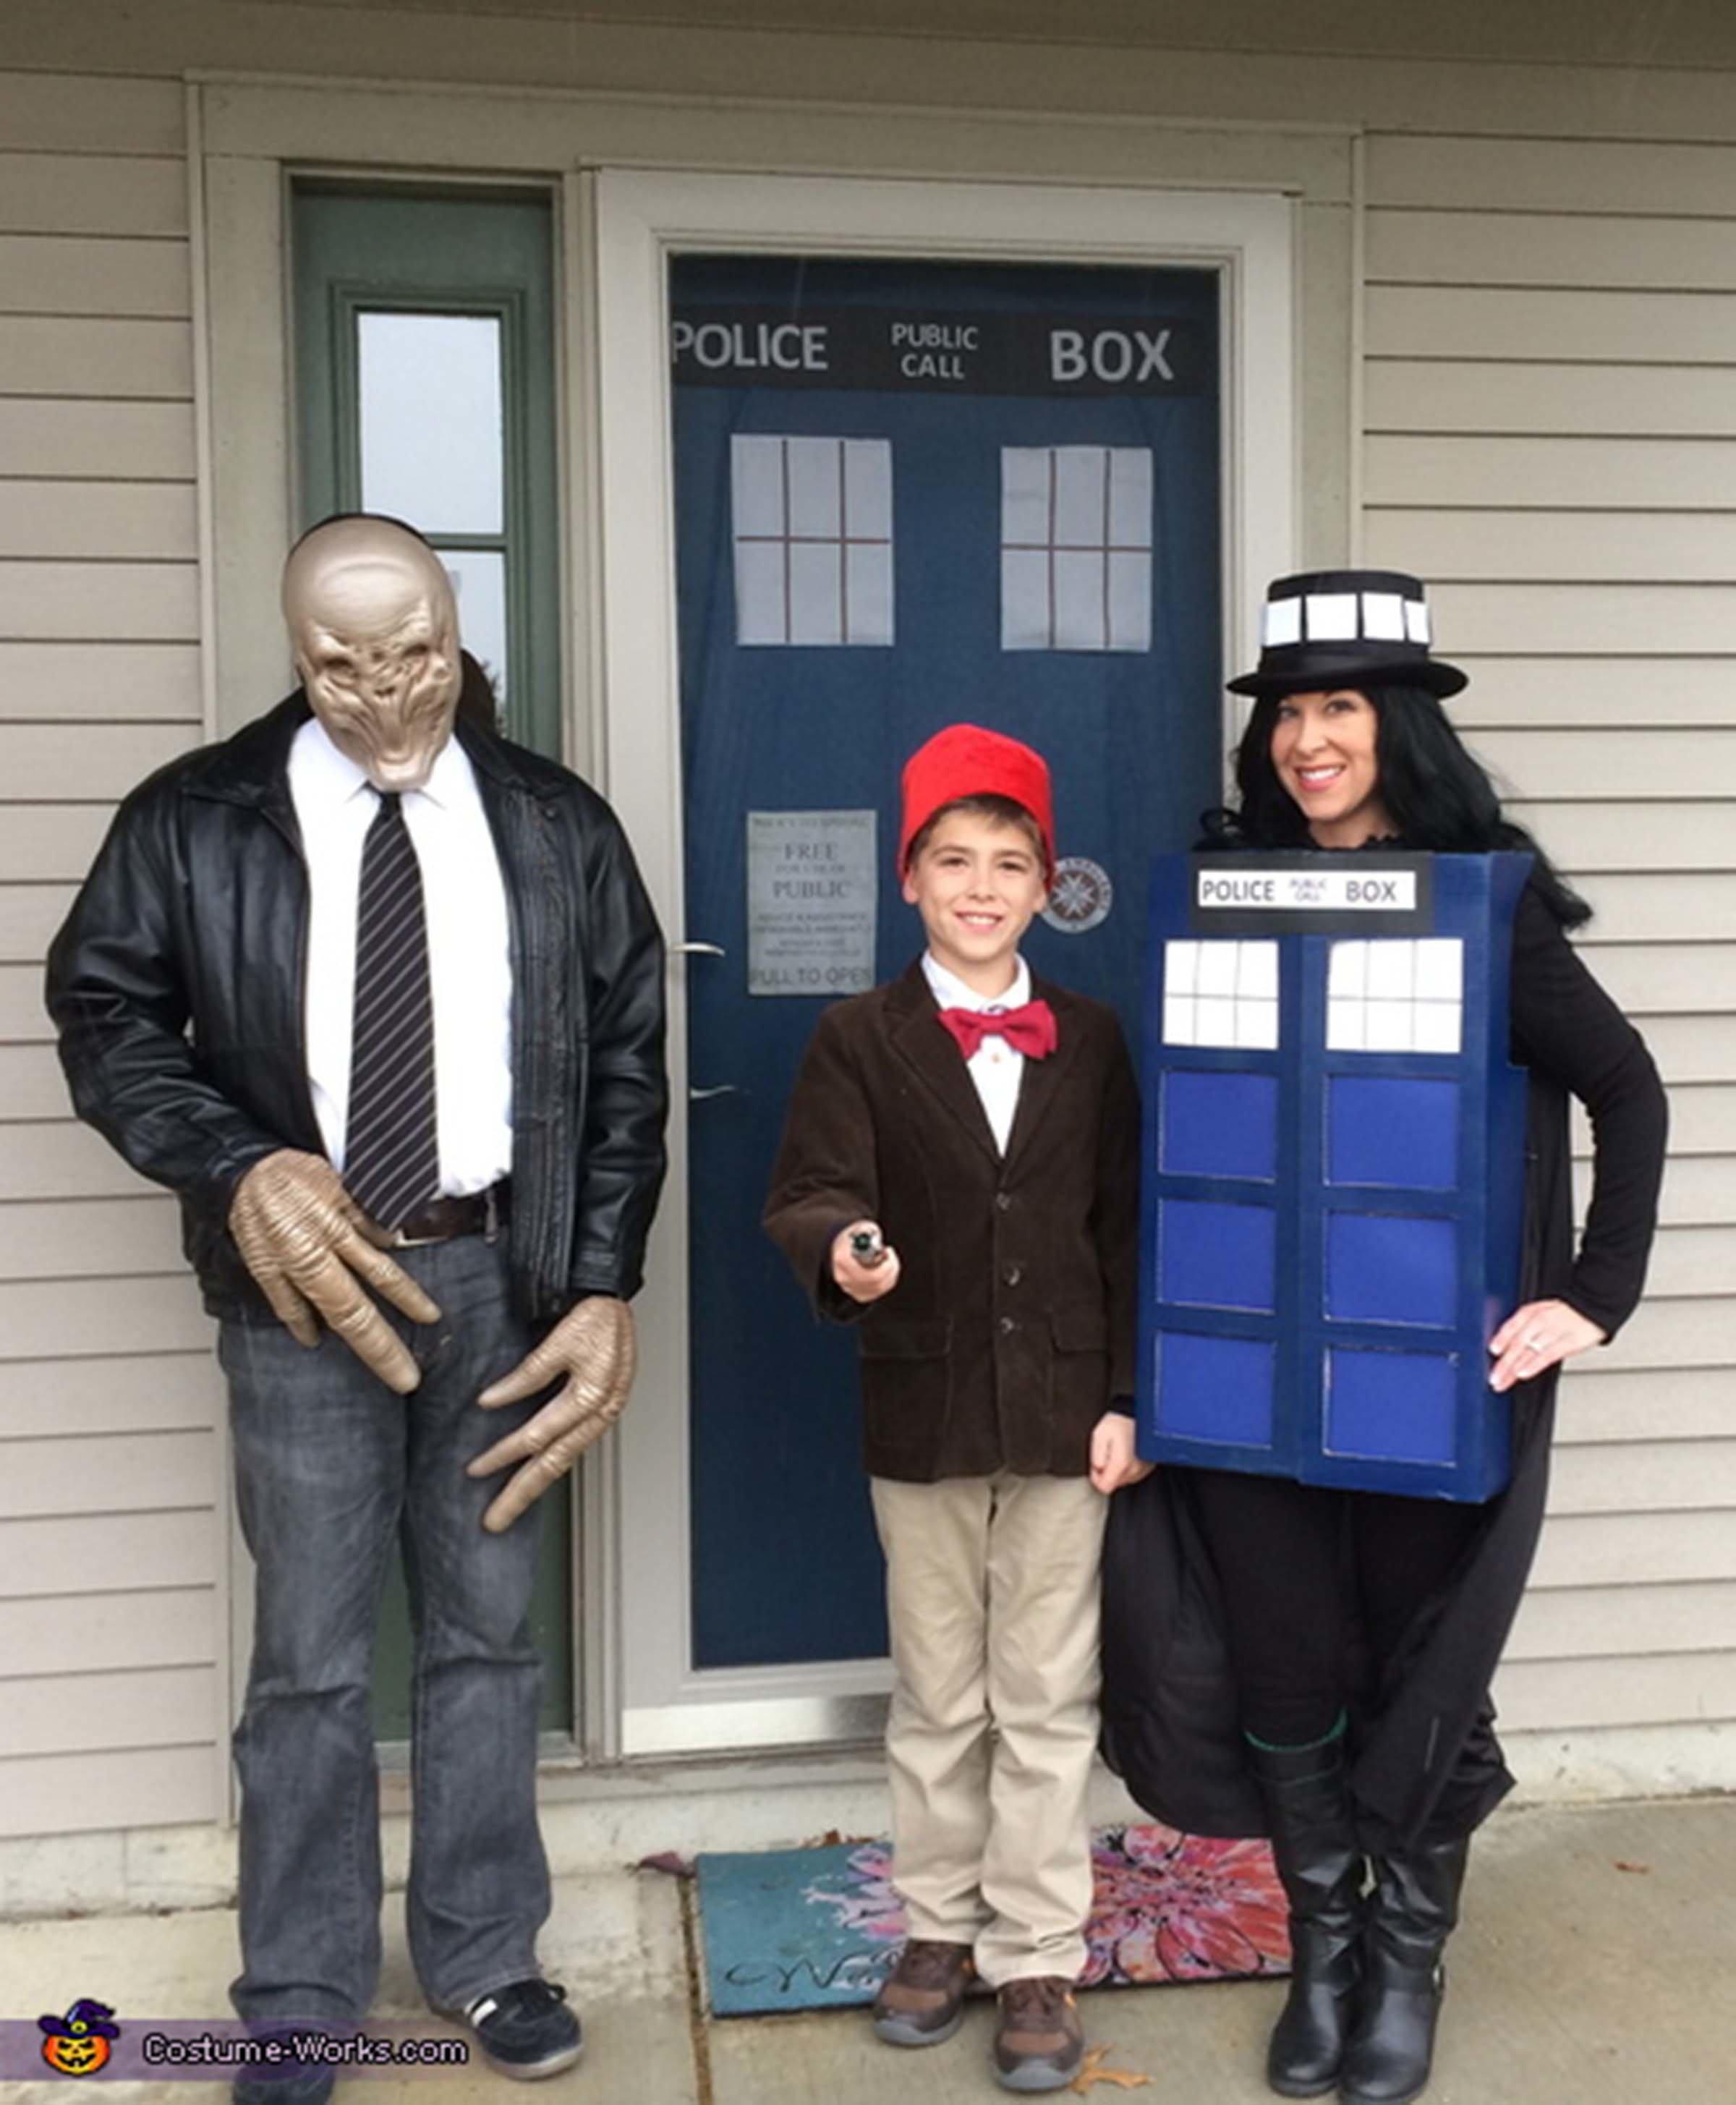 Via Costume Works. 17 Doctor Who Family. Via \u003ca ... Sc 1 St HuffPost  sc 1 st  Germanpascual.Com & Dr Who Halloween Costume u0026 Via Costume Works. 17 Doctor Who Family ...